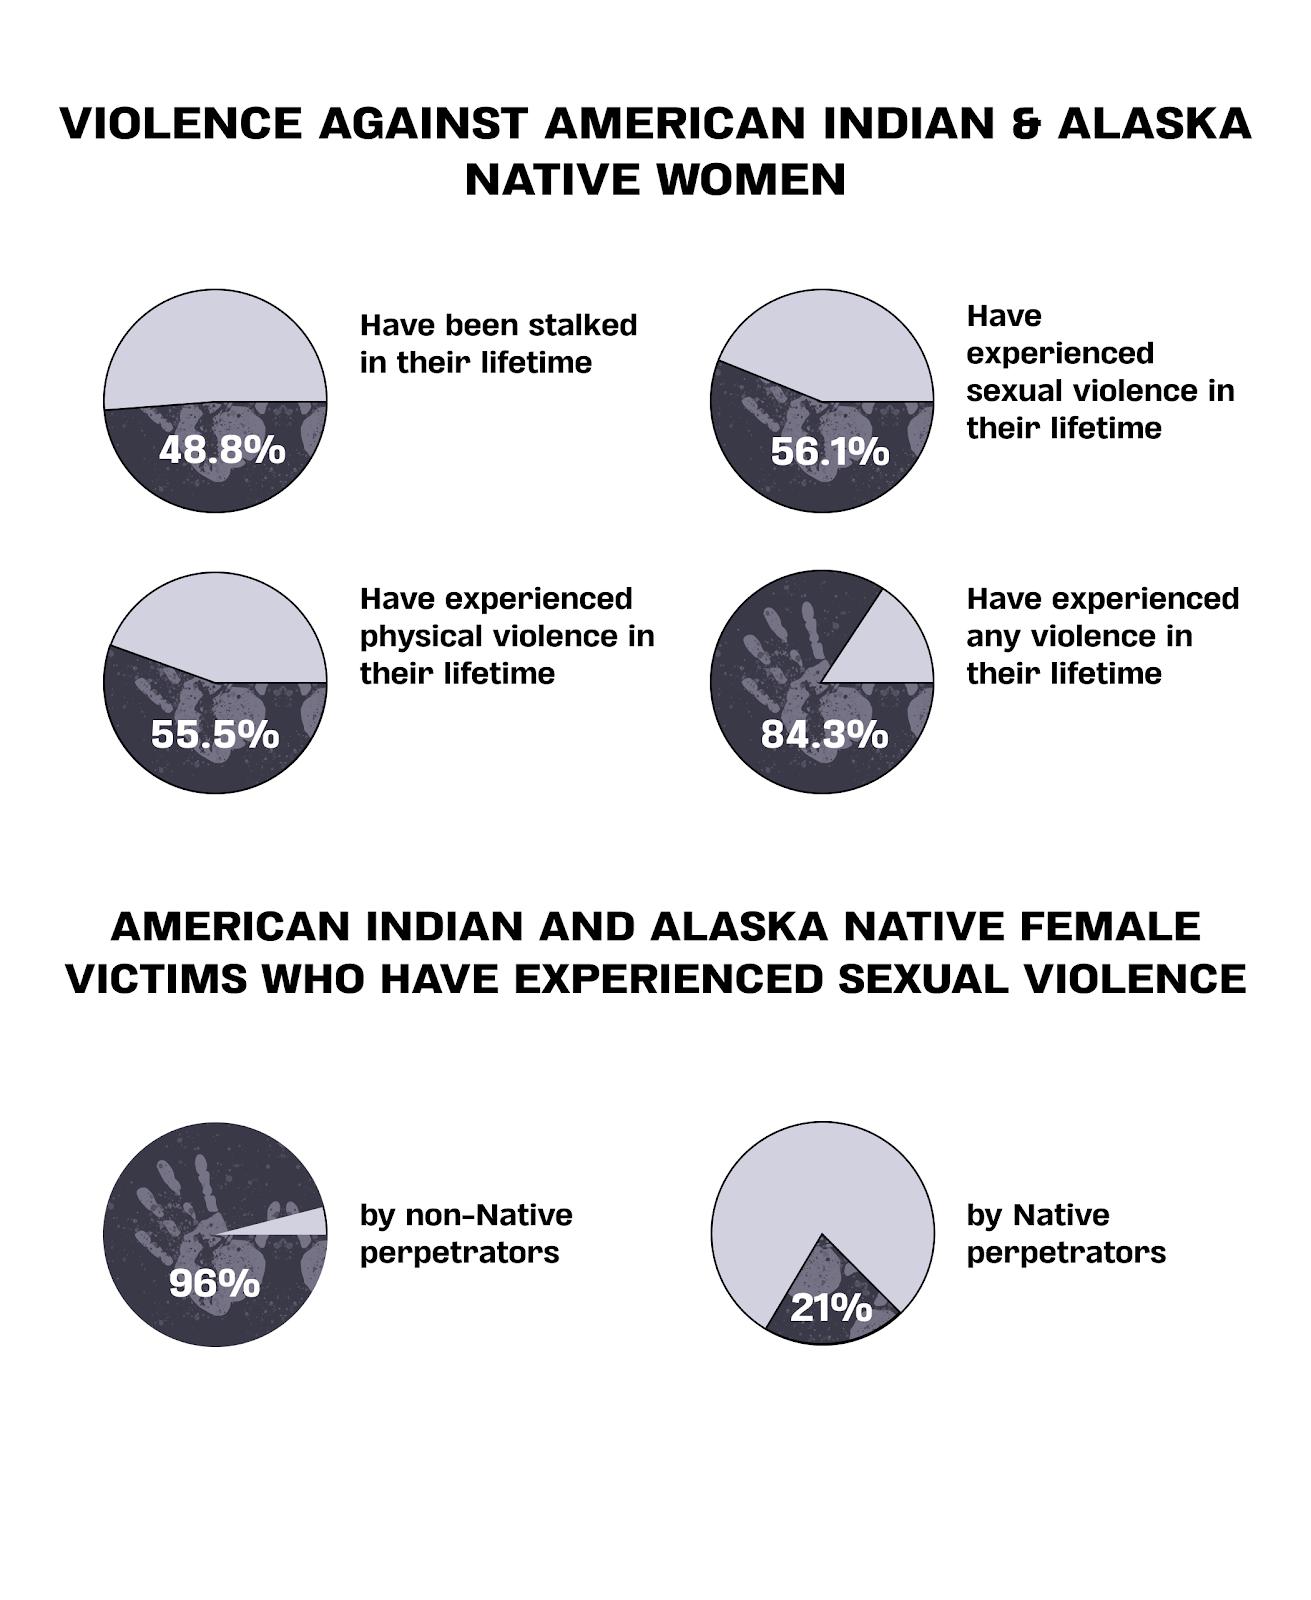 violence against women, American Indian, Alaska Native, American Indian women, Alaska Native women, MMIP